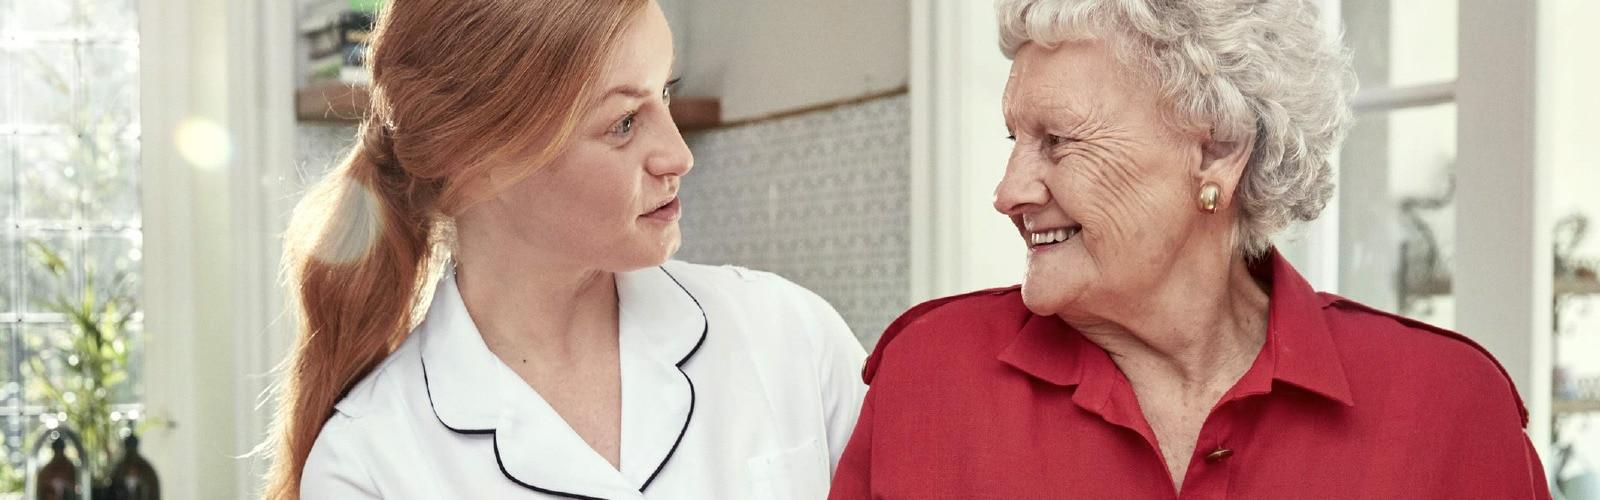 Nurse talking to a smiling elderly woman